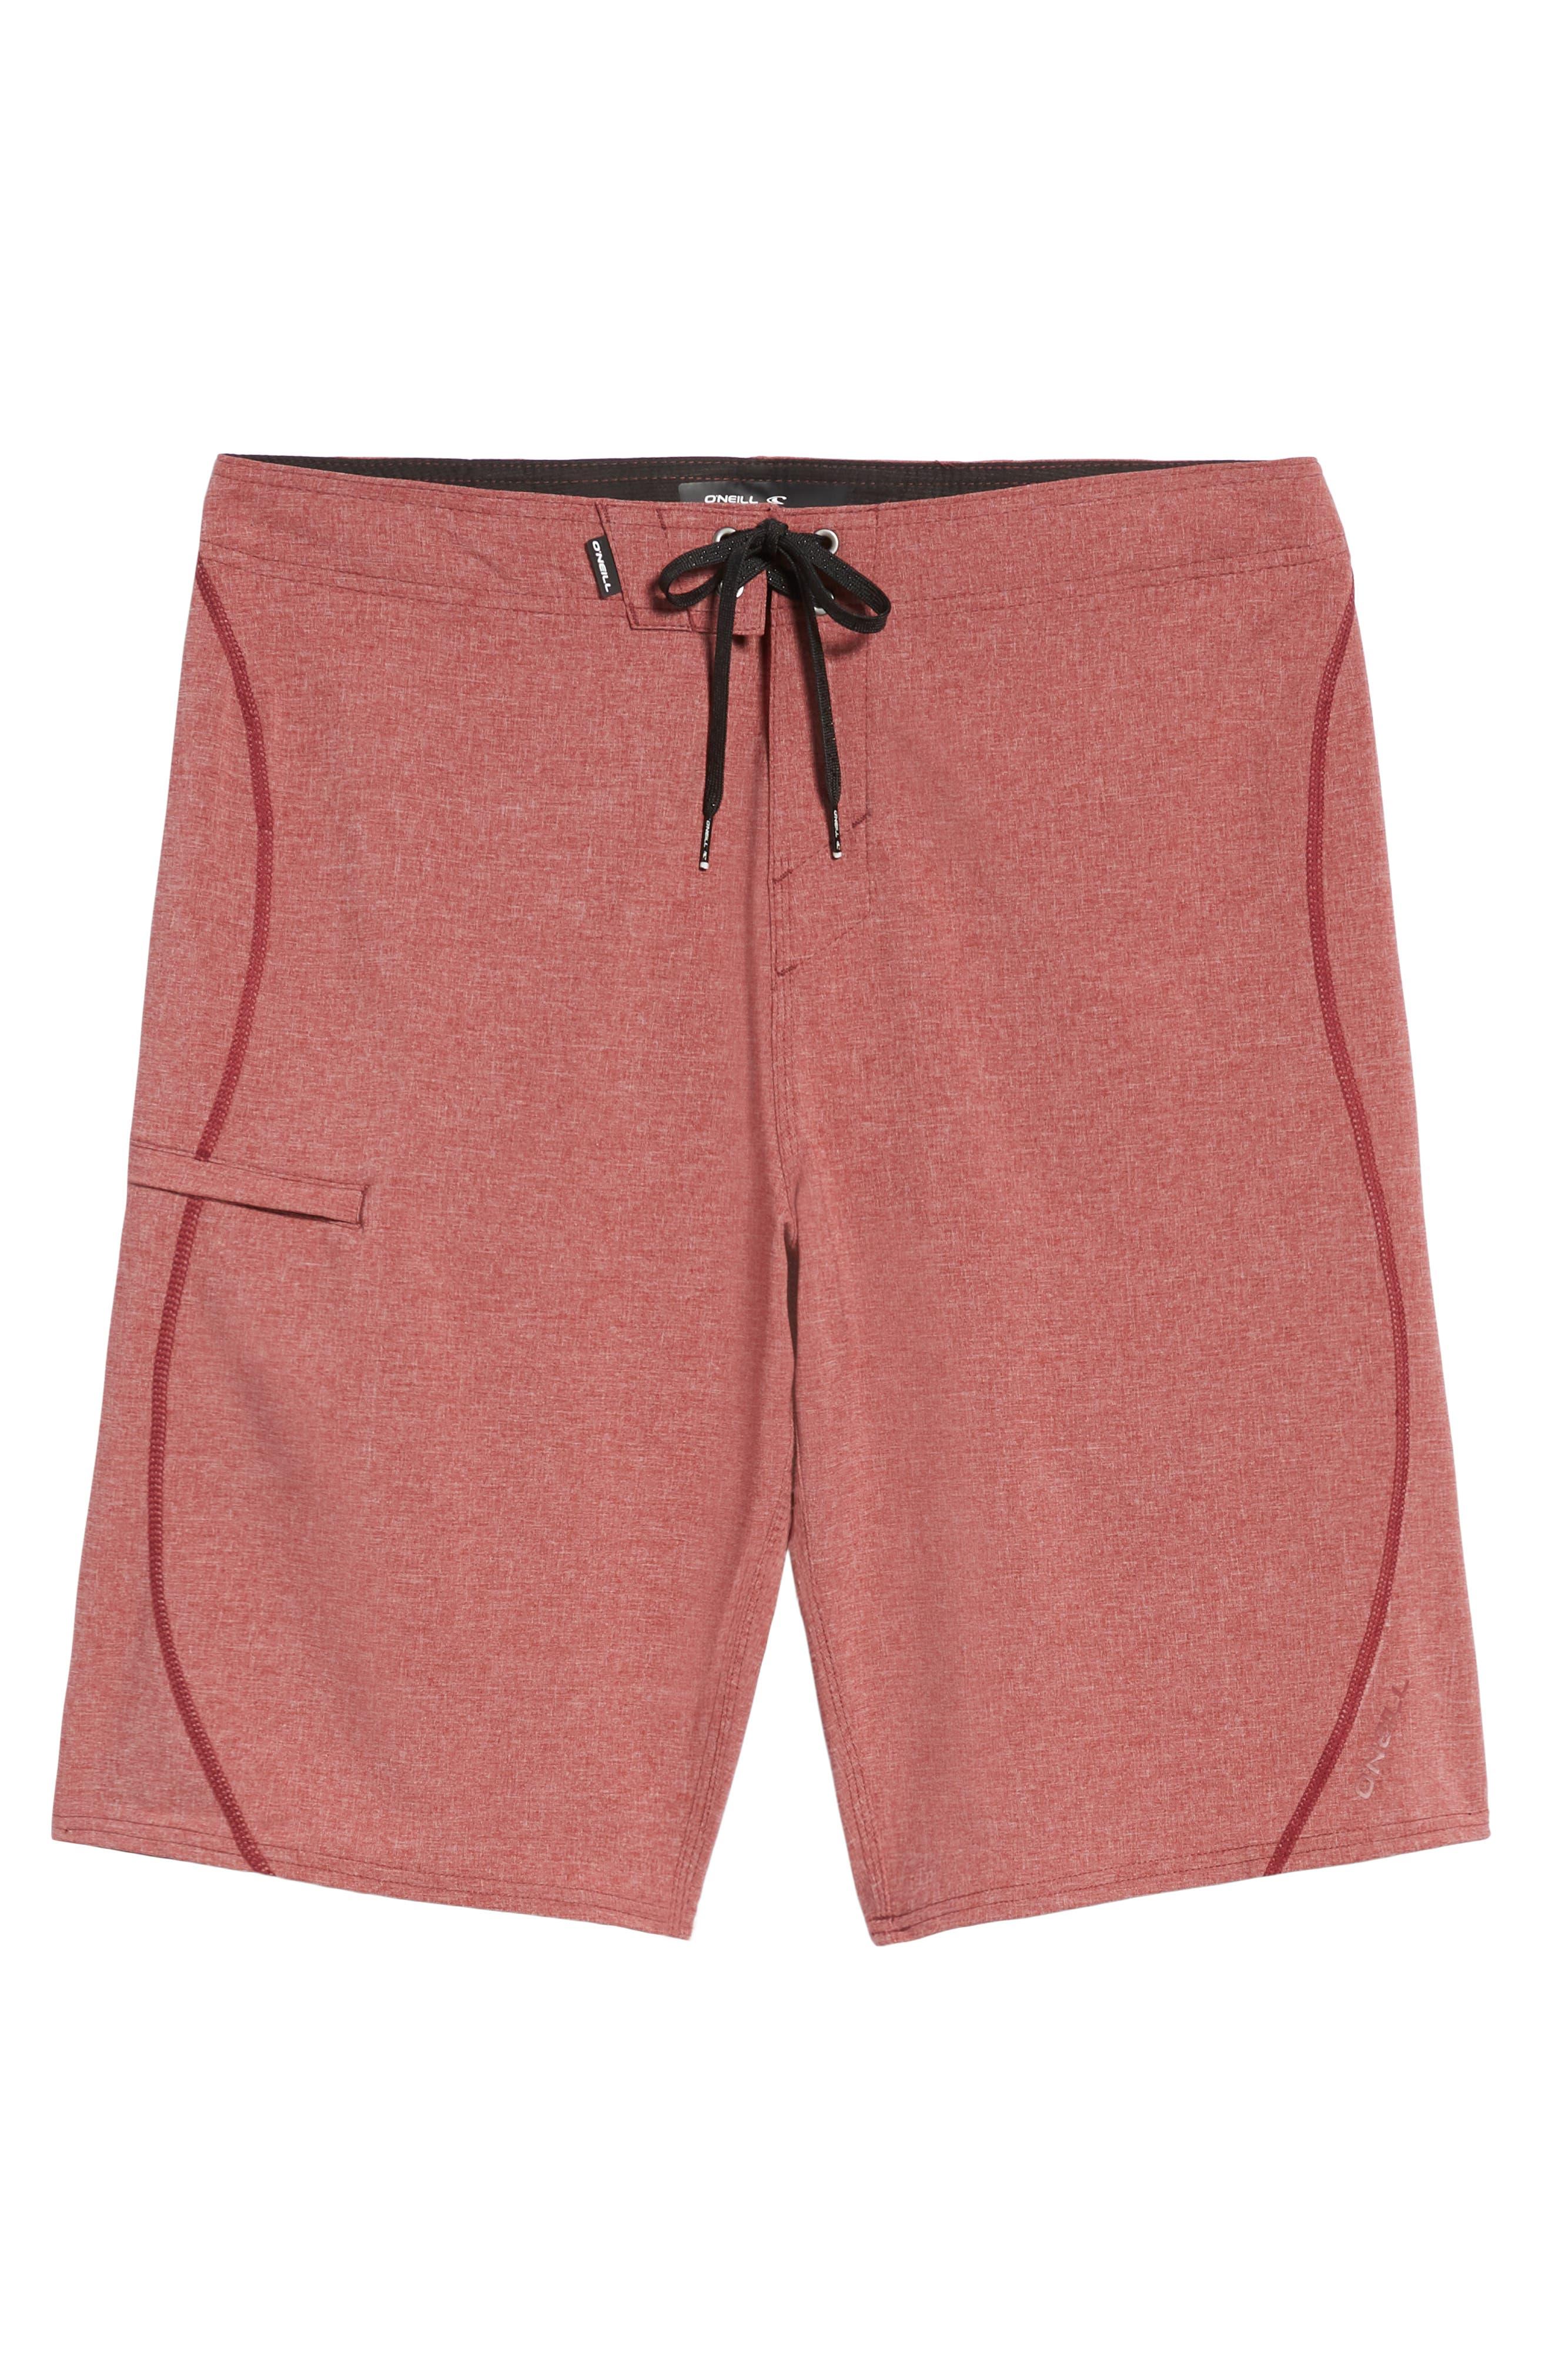 Hyperfreak S-Seam Board Shorts,                             Alternate thumbnail 6, color,                             CRIMSON